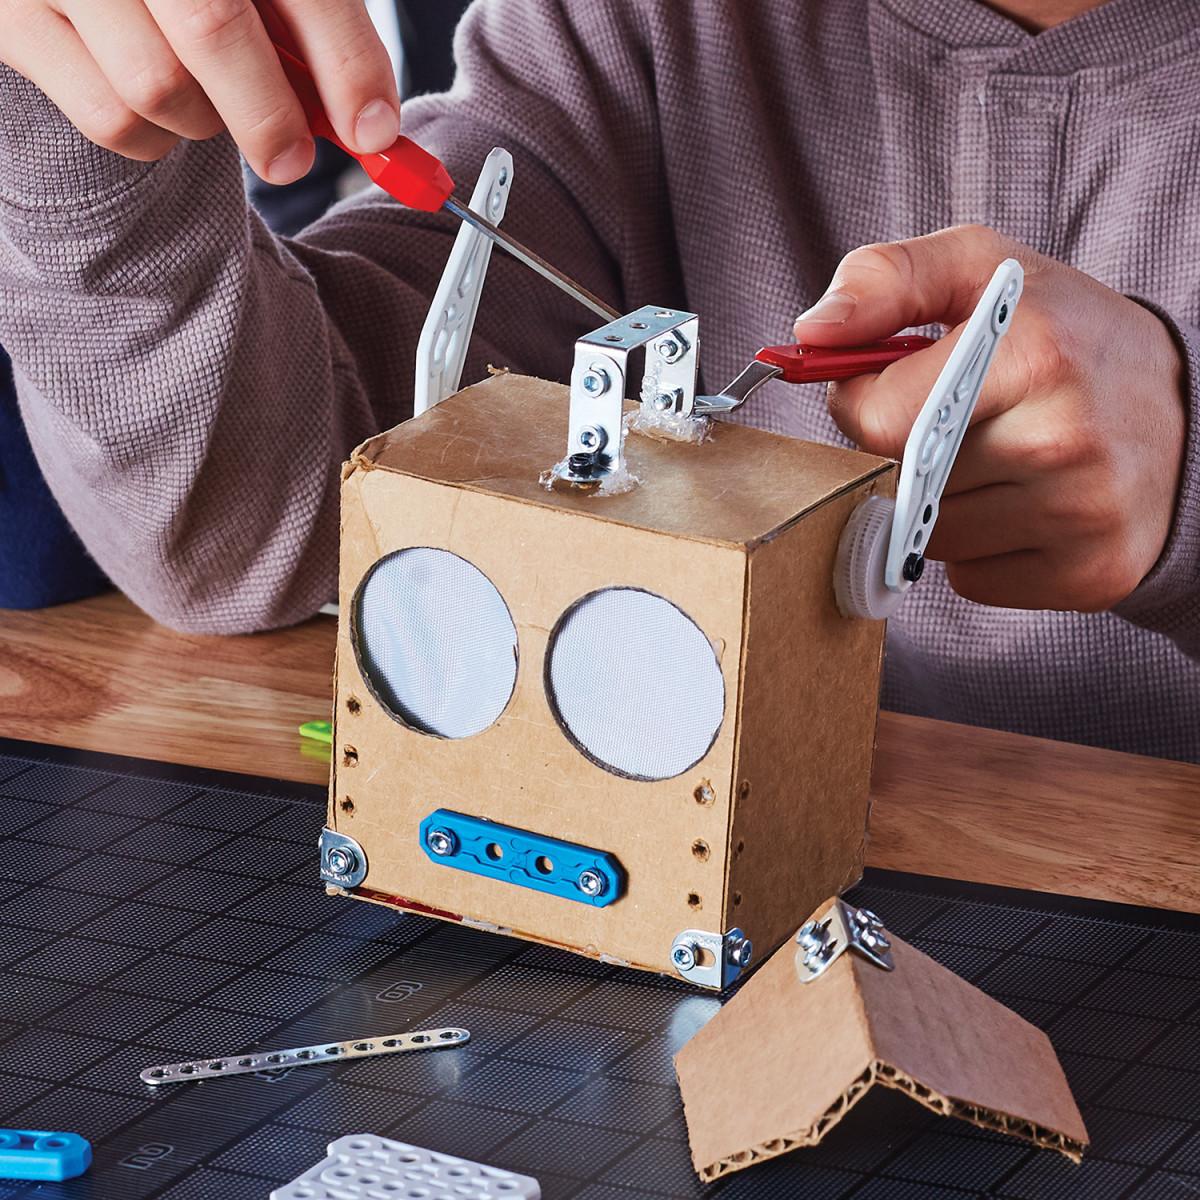 MAKER TOOL MECCANO jeux de construction Robot